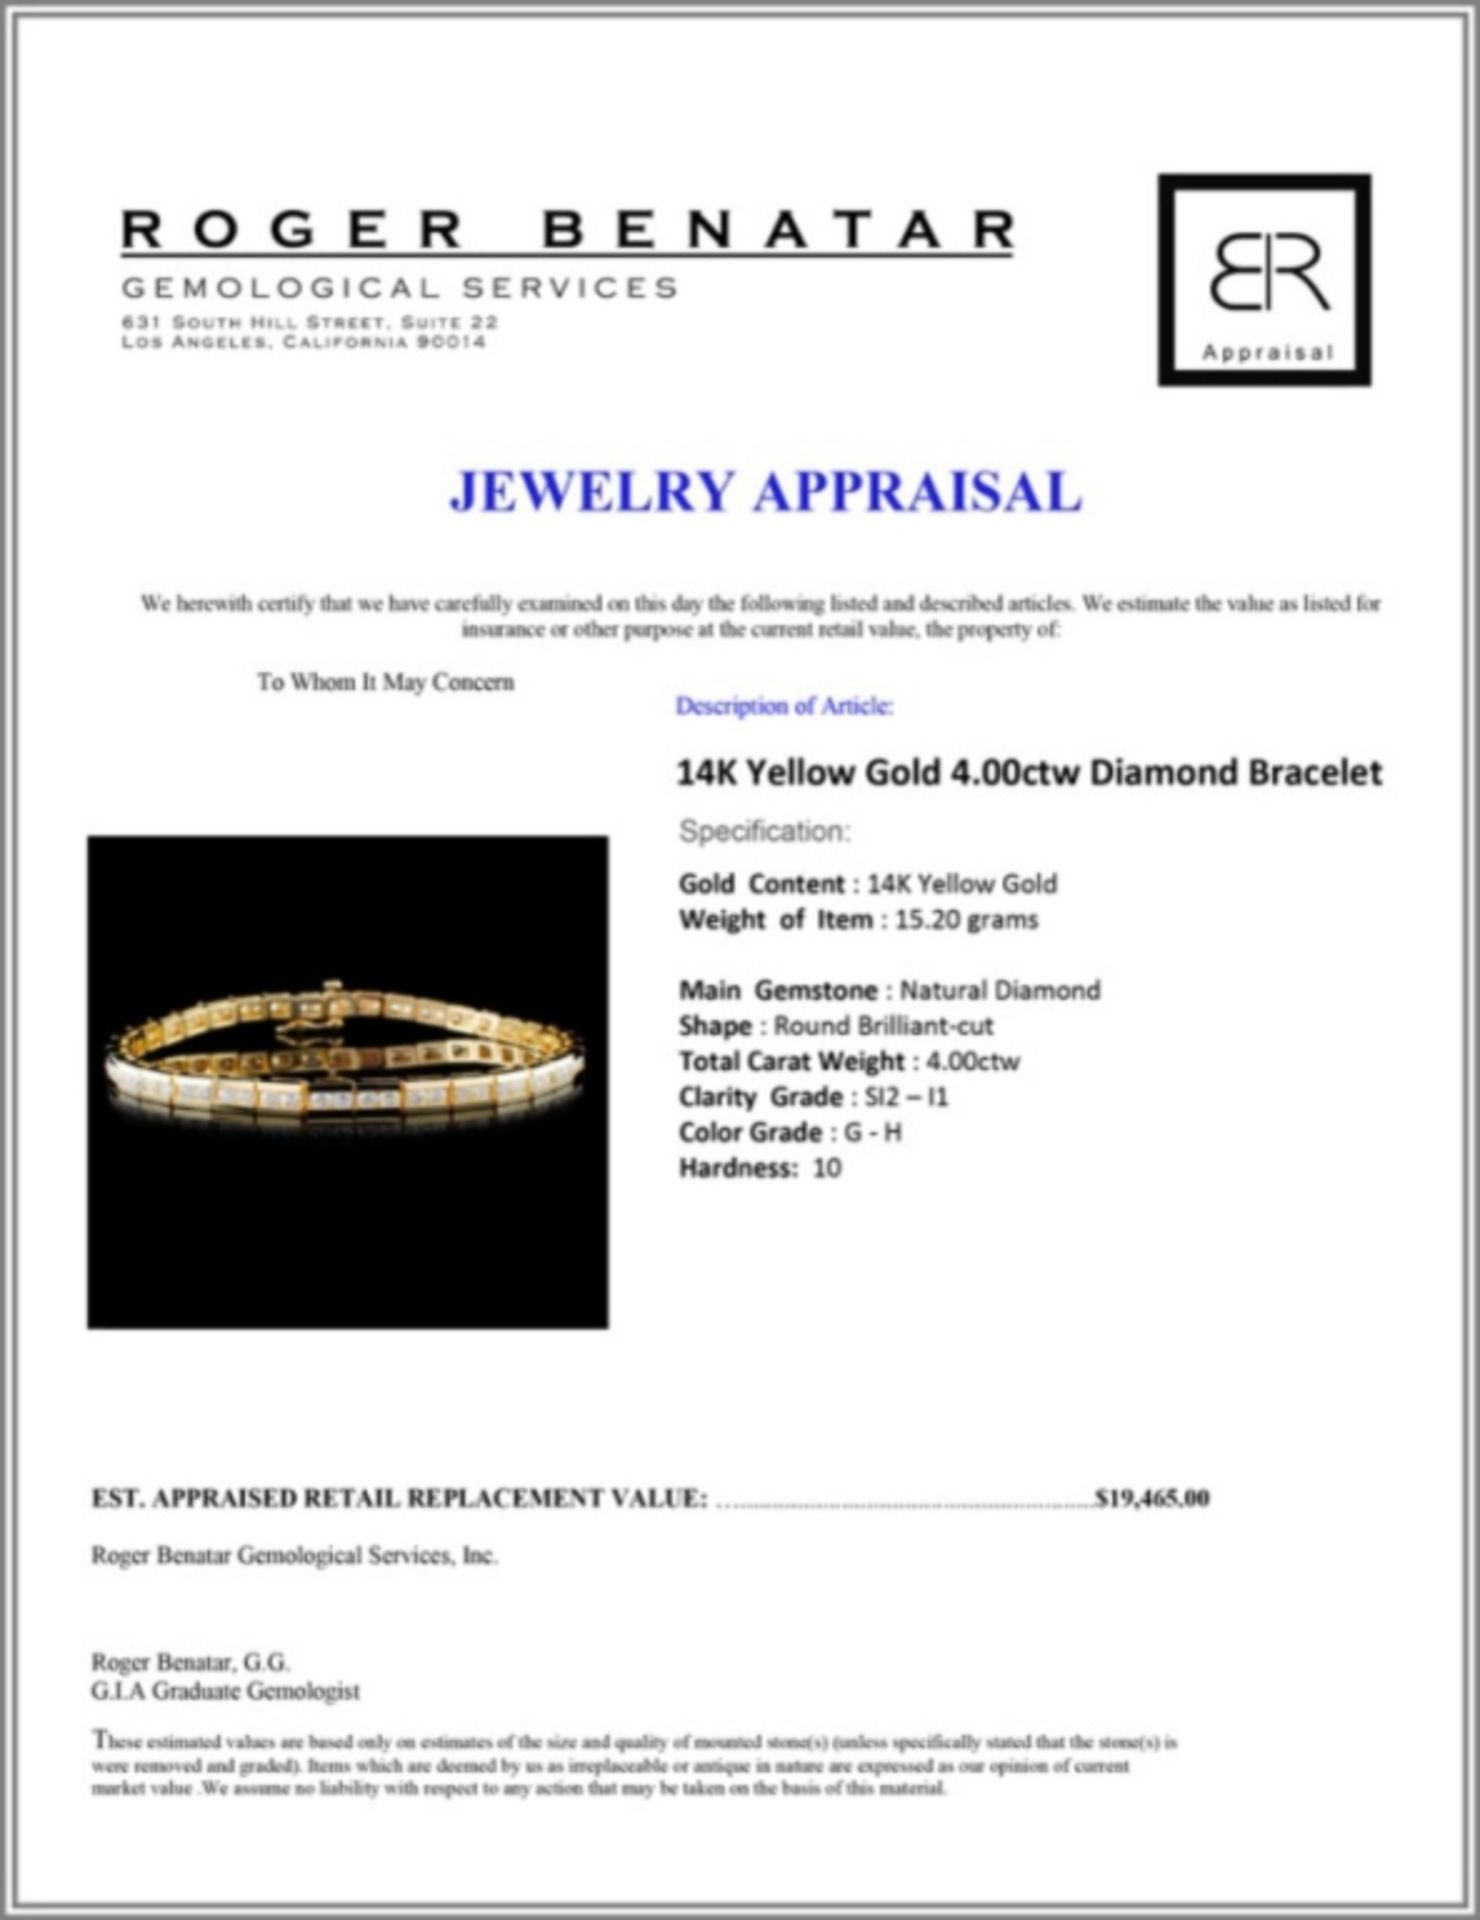 14K Yellow Gold 4.00ctw Diamond Bracelet - Image 3 of 3